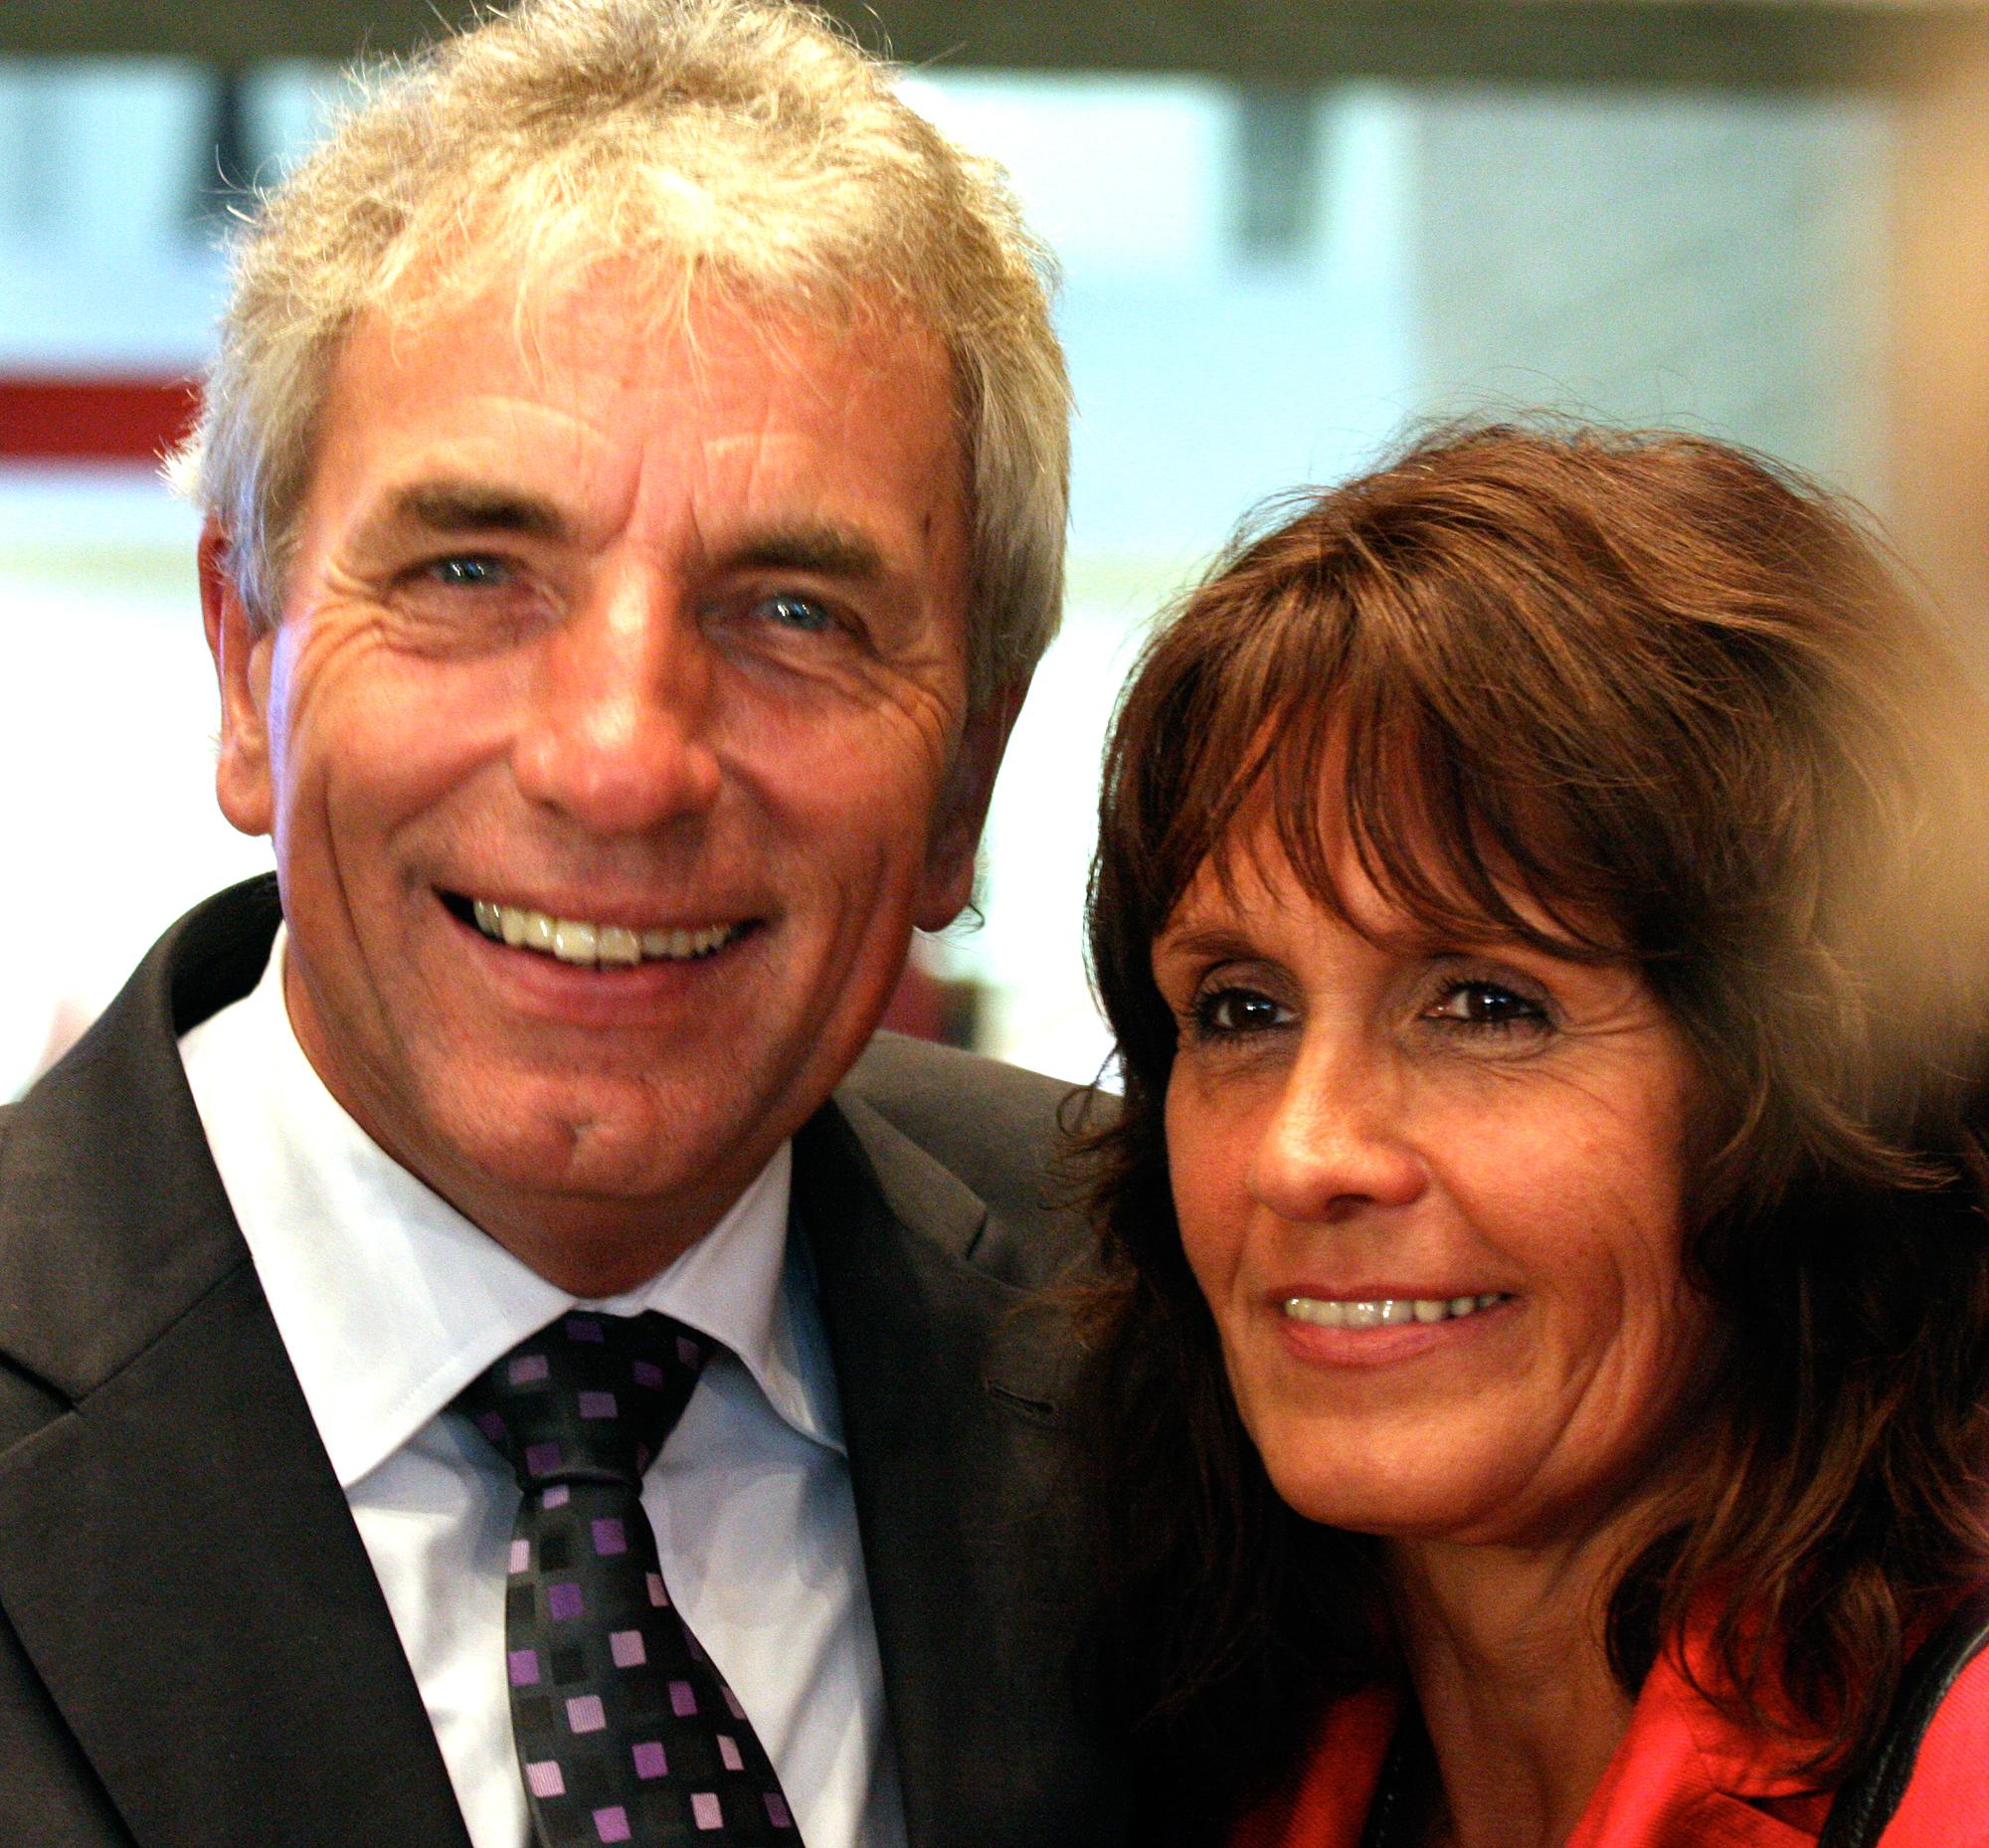 Kölns gegenwärtiges Stadtoberhaupt ist Oberbürgermeister Jürgen Roters, hier mit seiner Ehefrau Angela Roters.